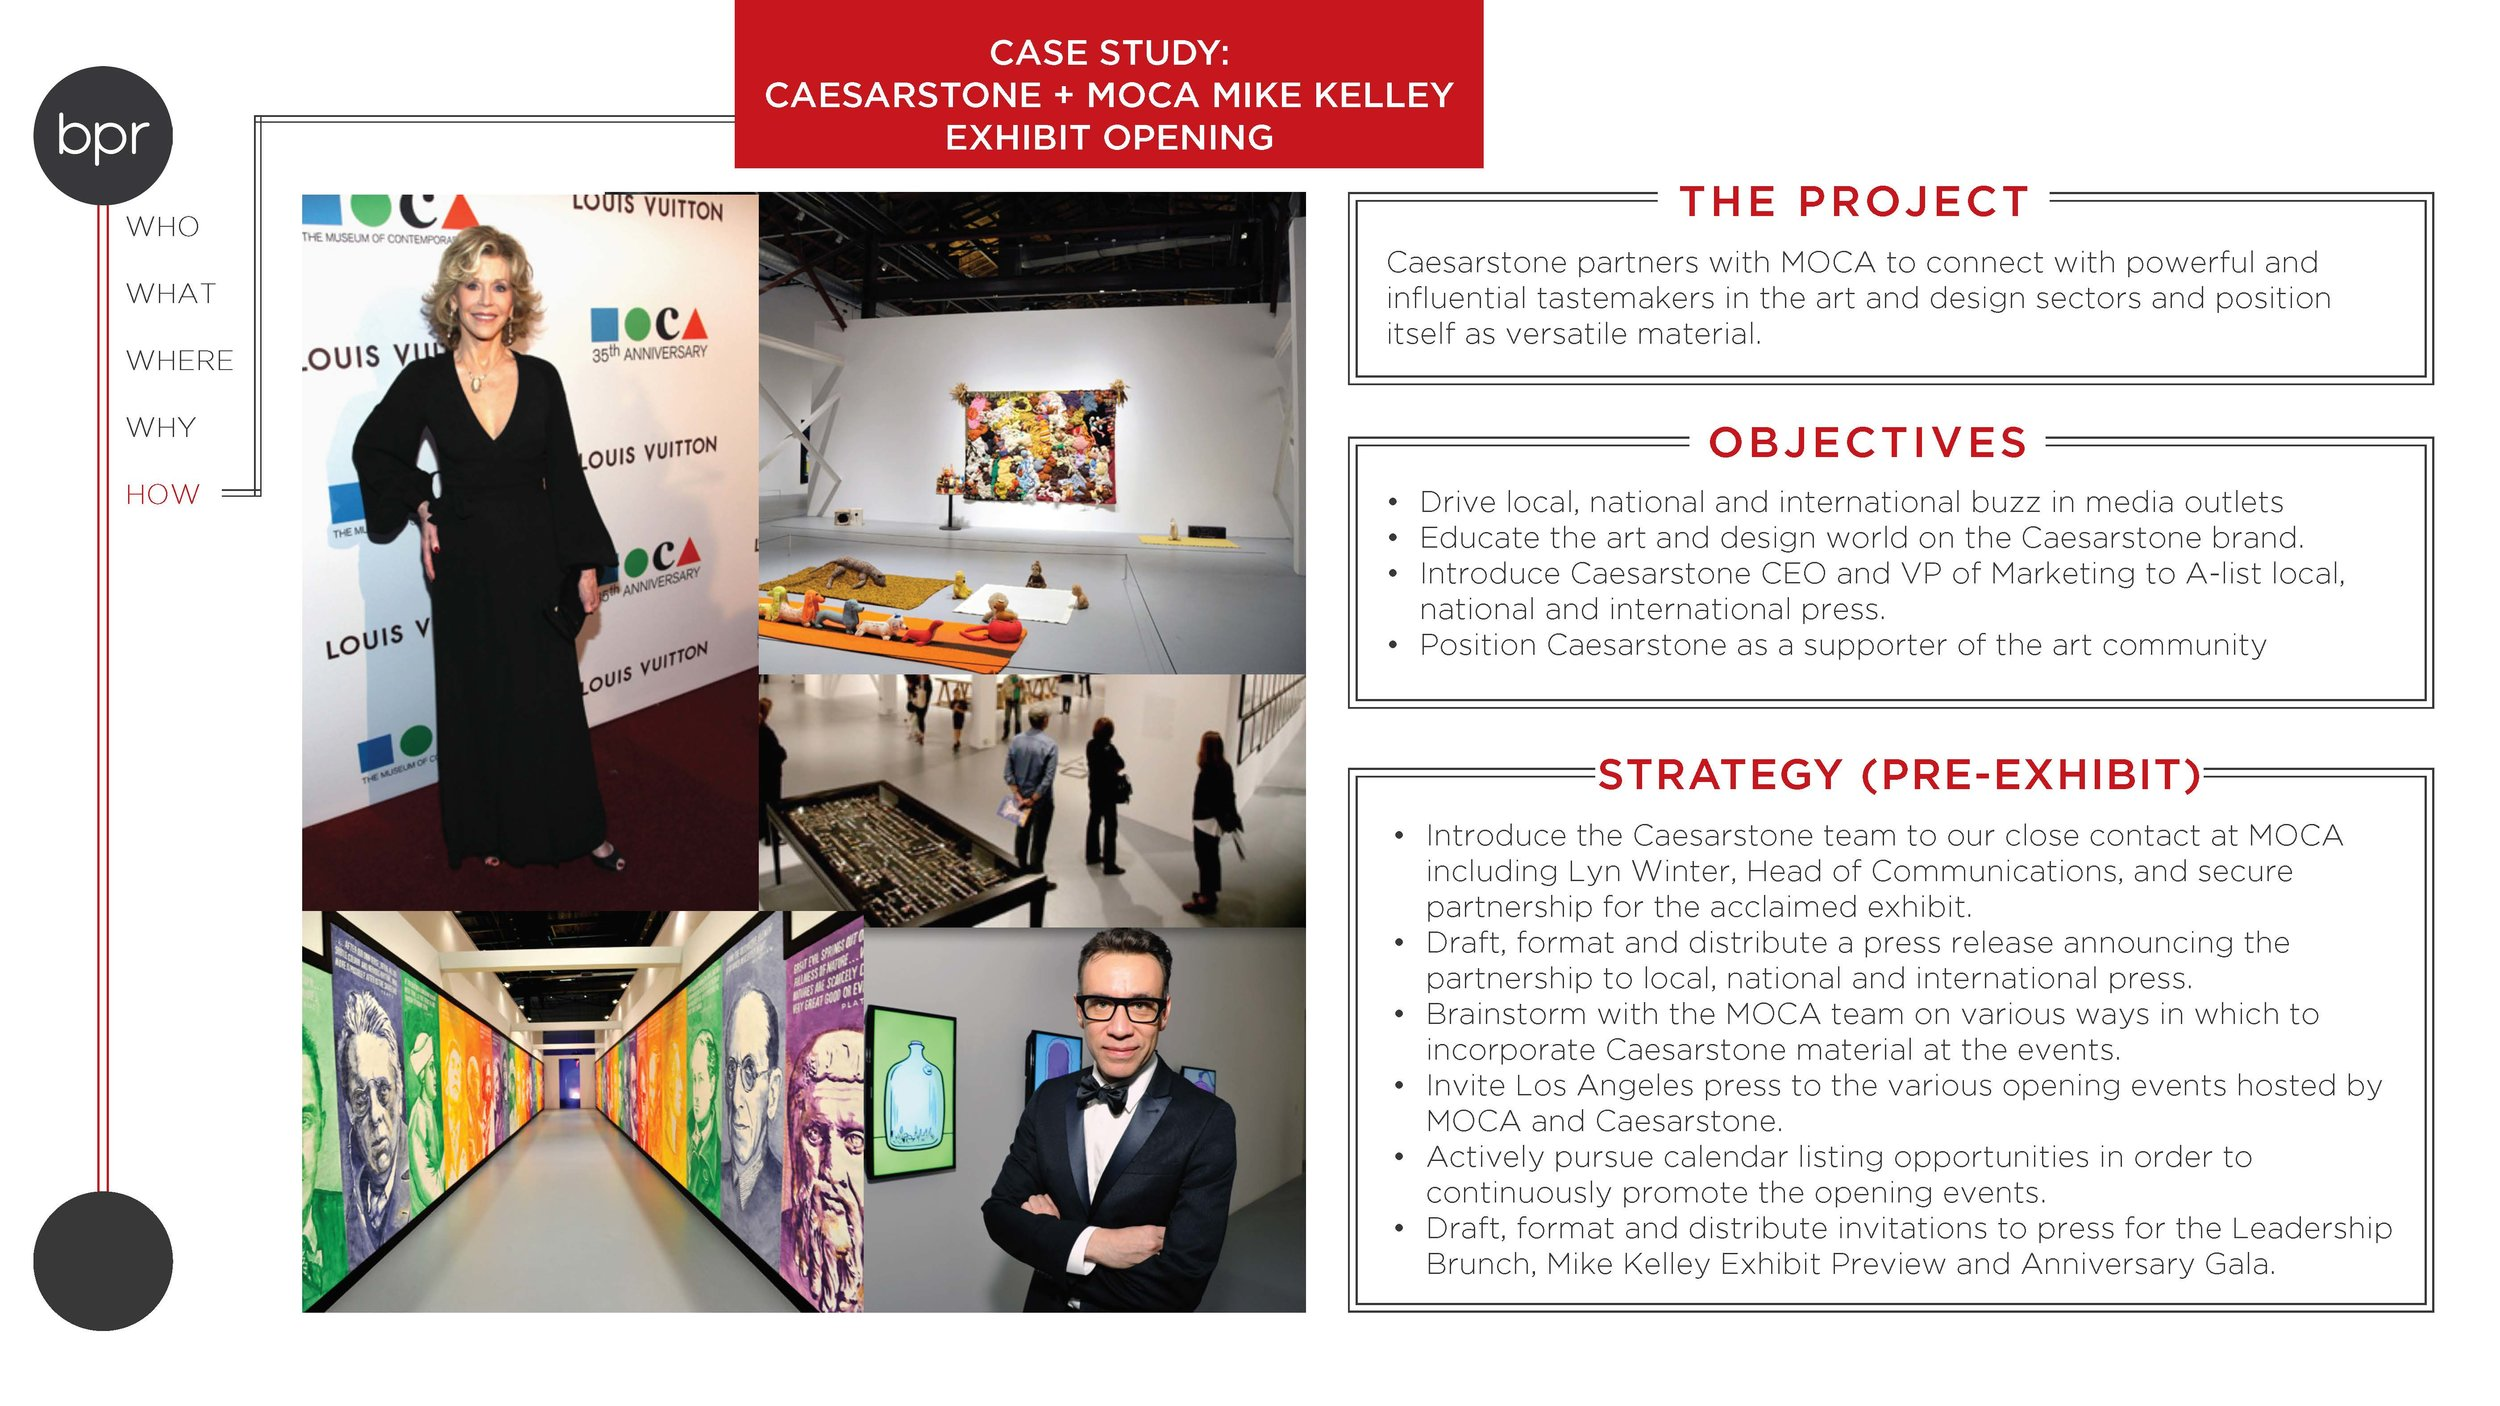 Caesarstone+MOCA Case Study_Page_2.jpg